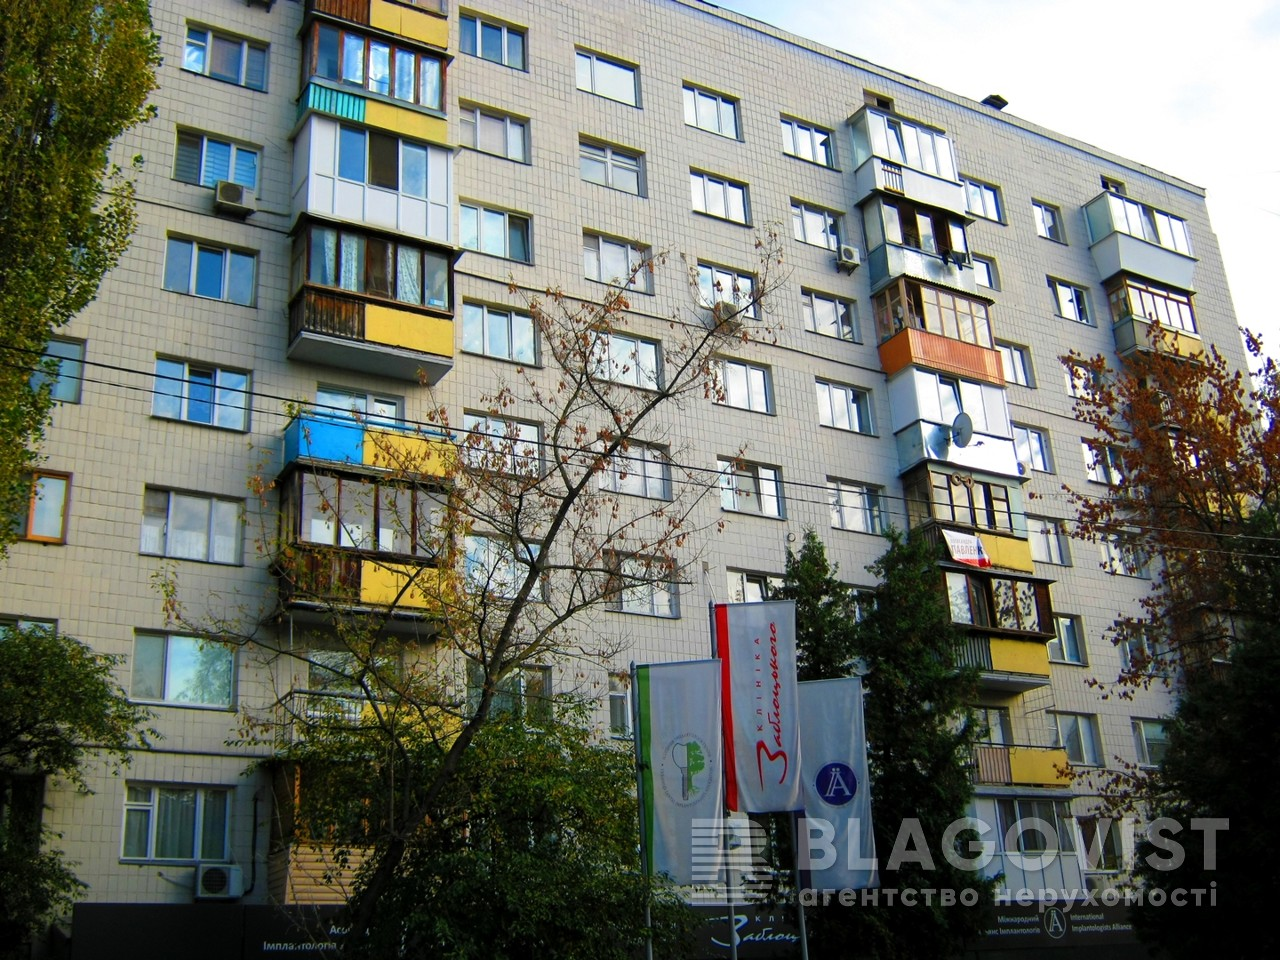 Квартира F-9454, Новогоспитальная (Щорса пер.), 5, Киев - Фото 2